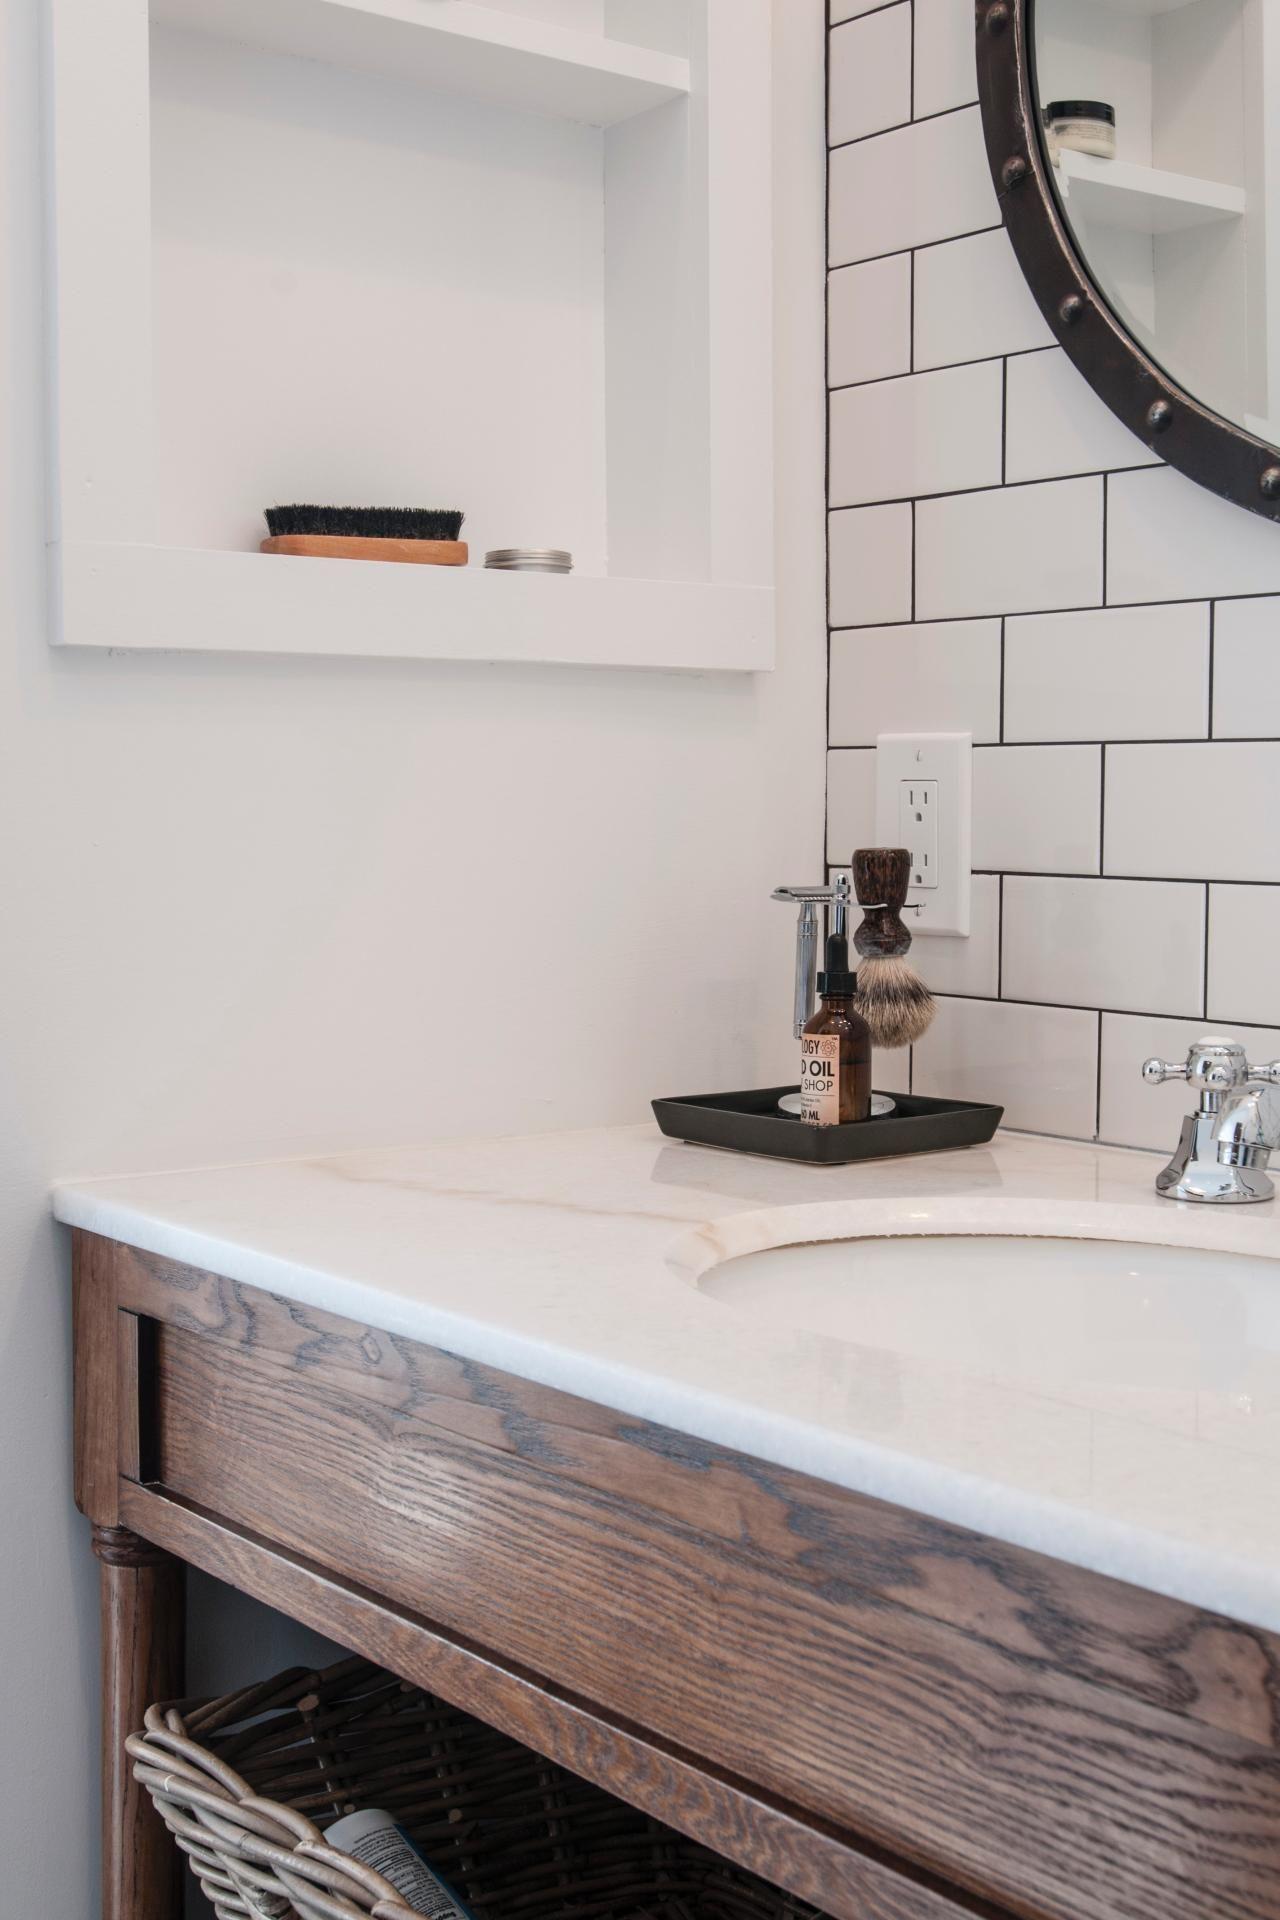 Photos Hgtv Timeless Subway Tile Bathroom Backsplash. lowes bathroom ...